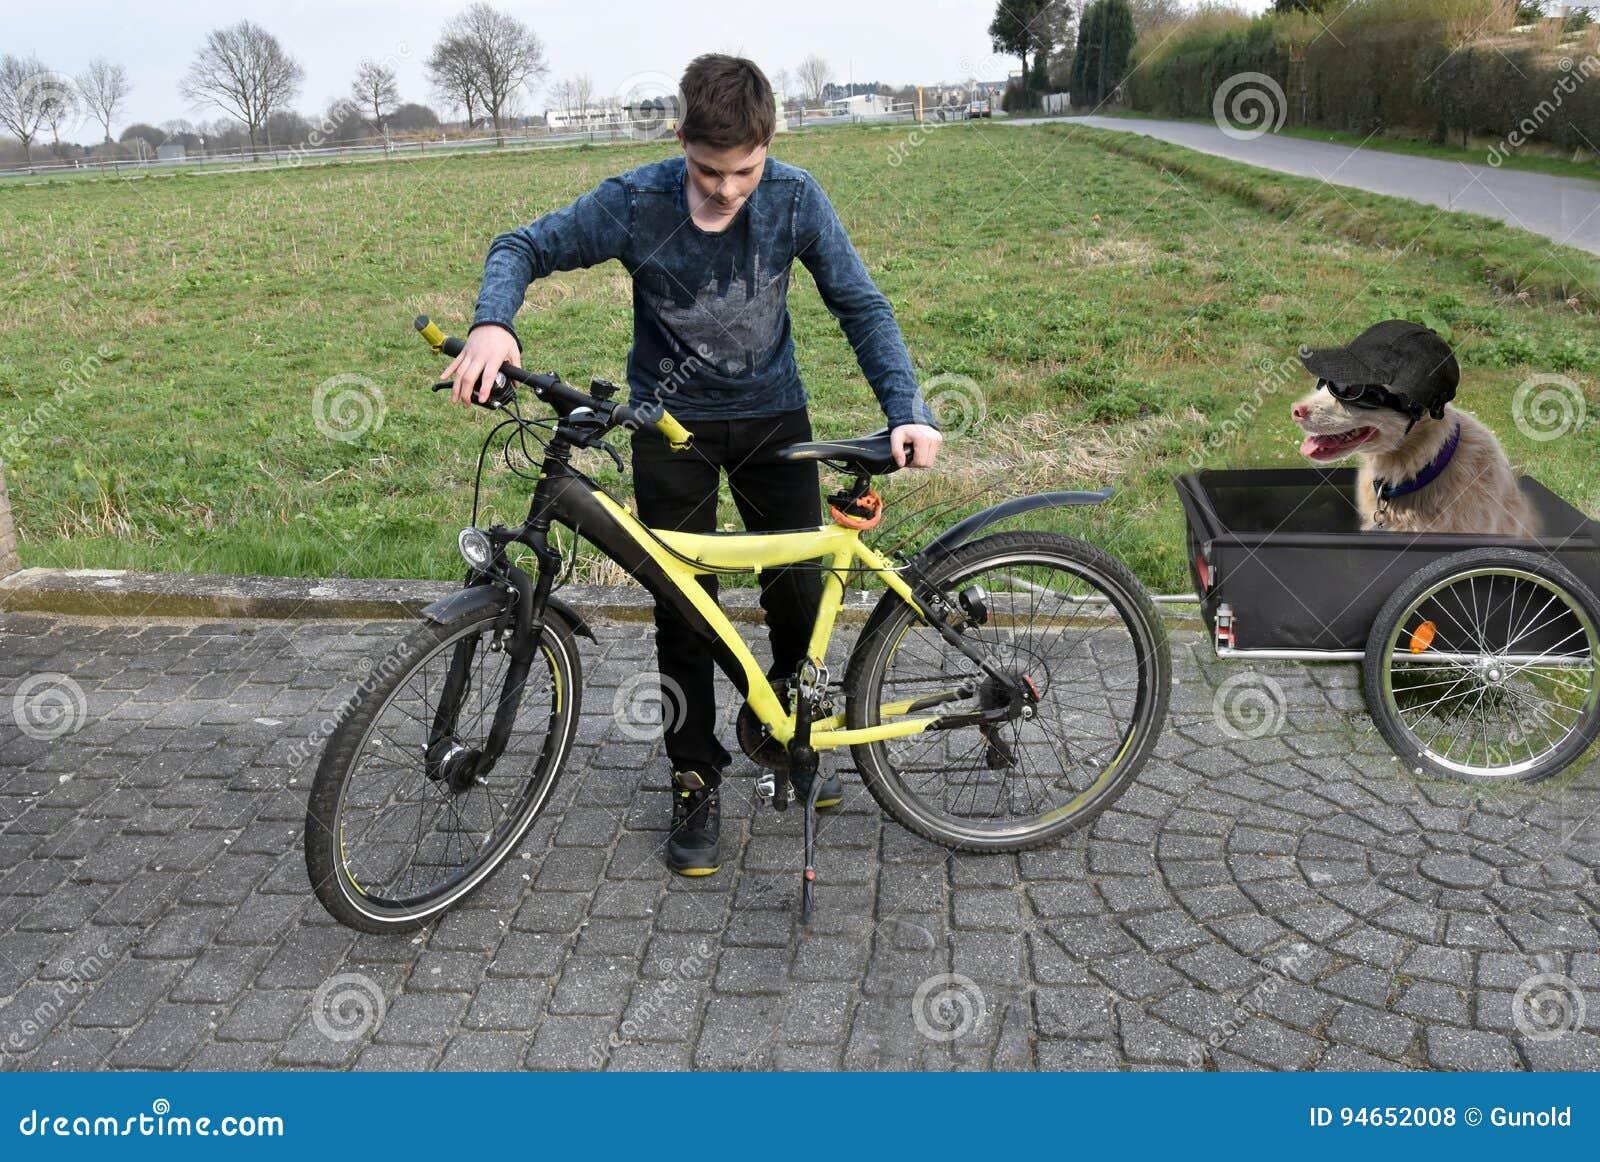 Boy and dog making a trip